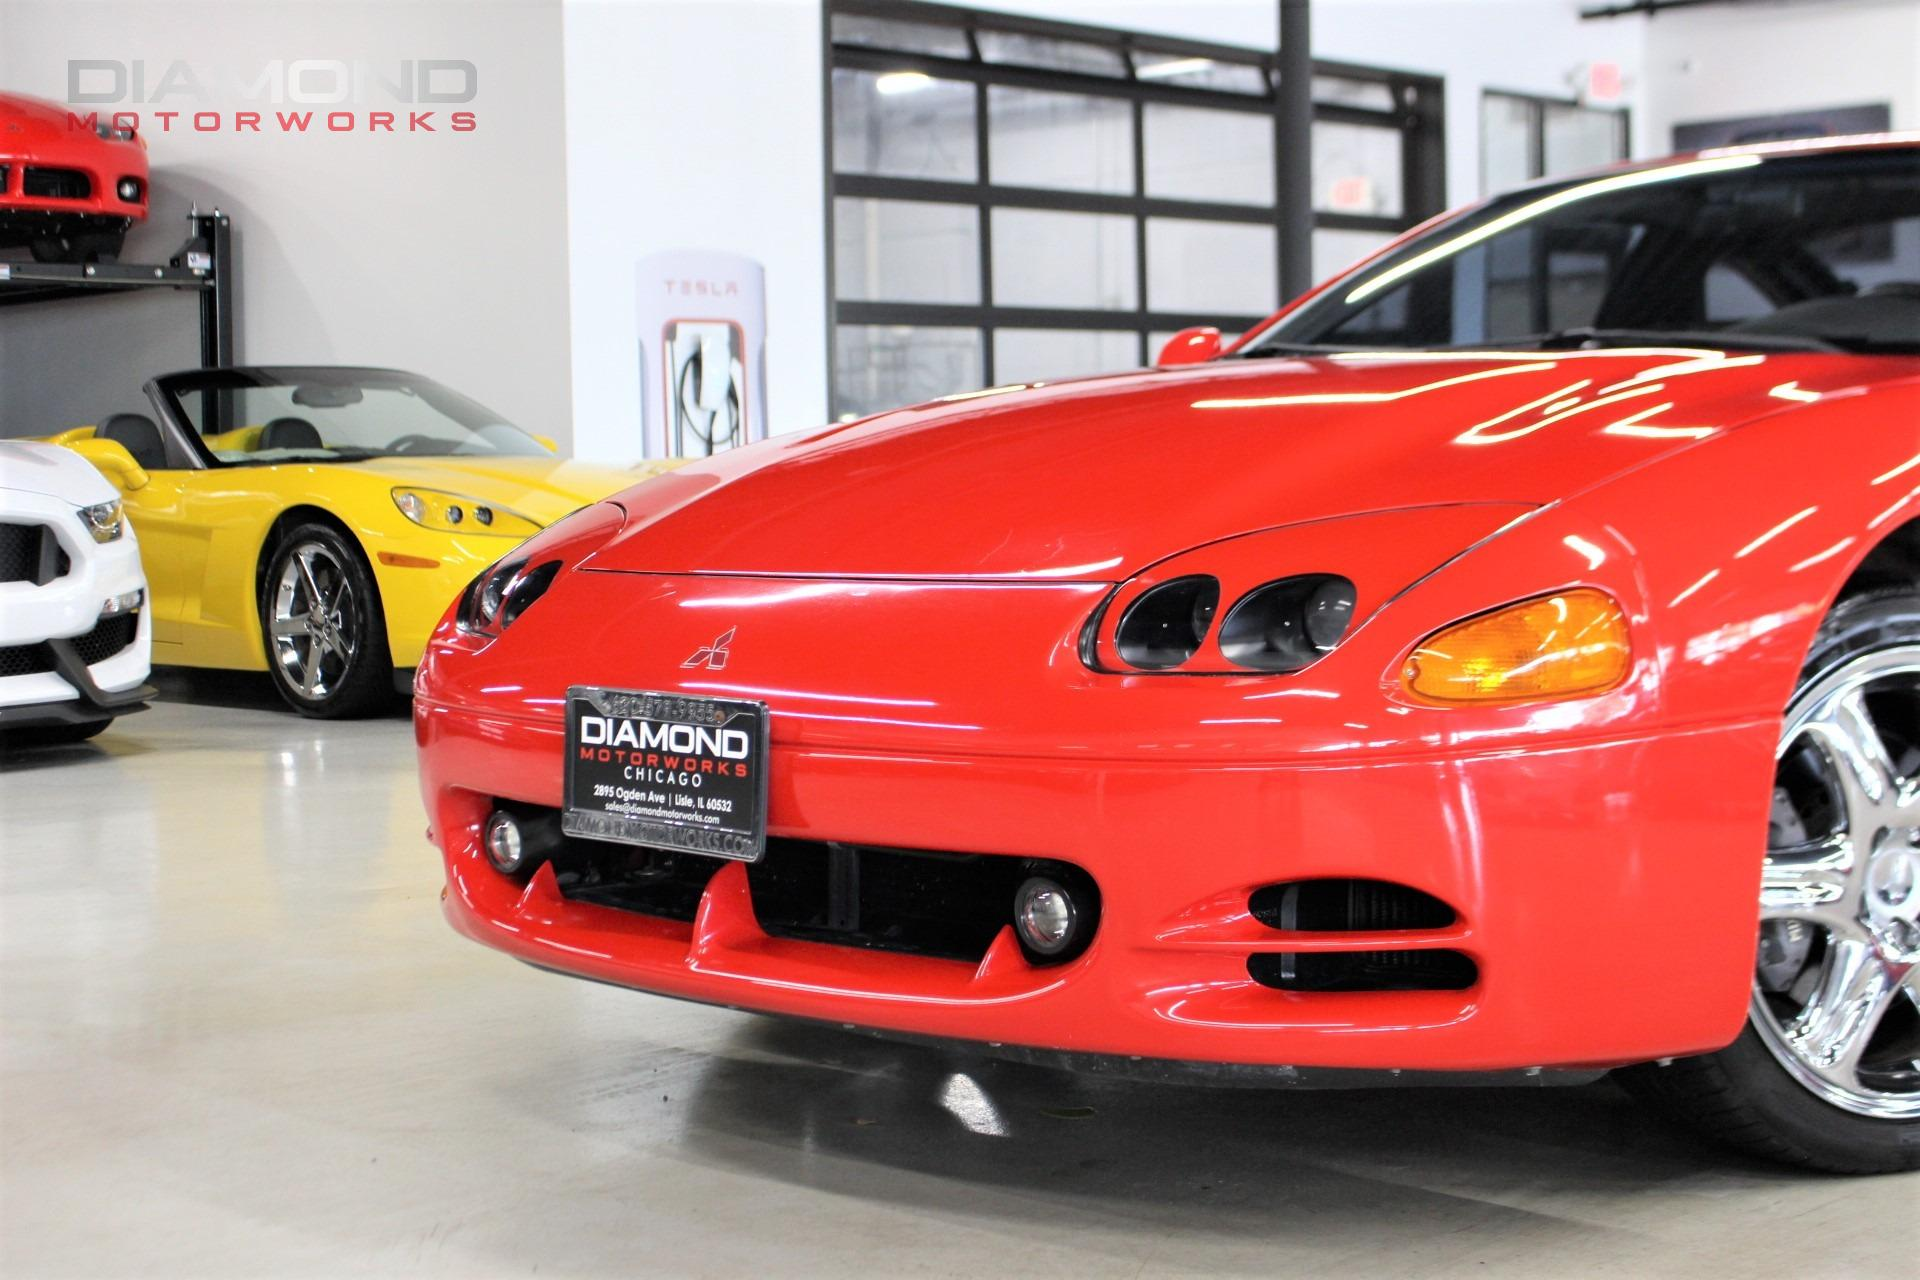 Used-1995-Mitsubishi-3000GT-VR-4-Turbo